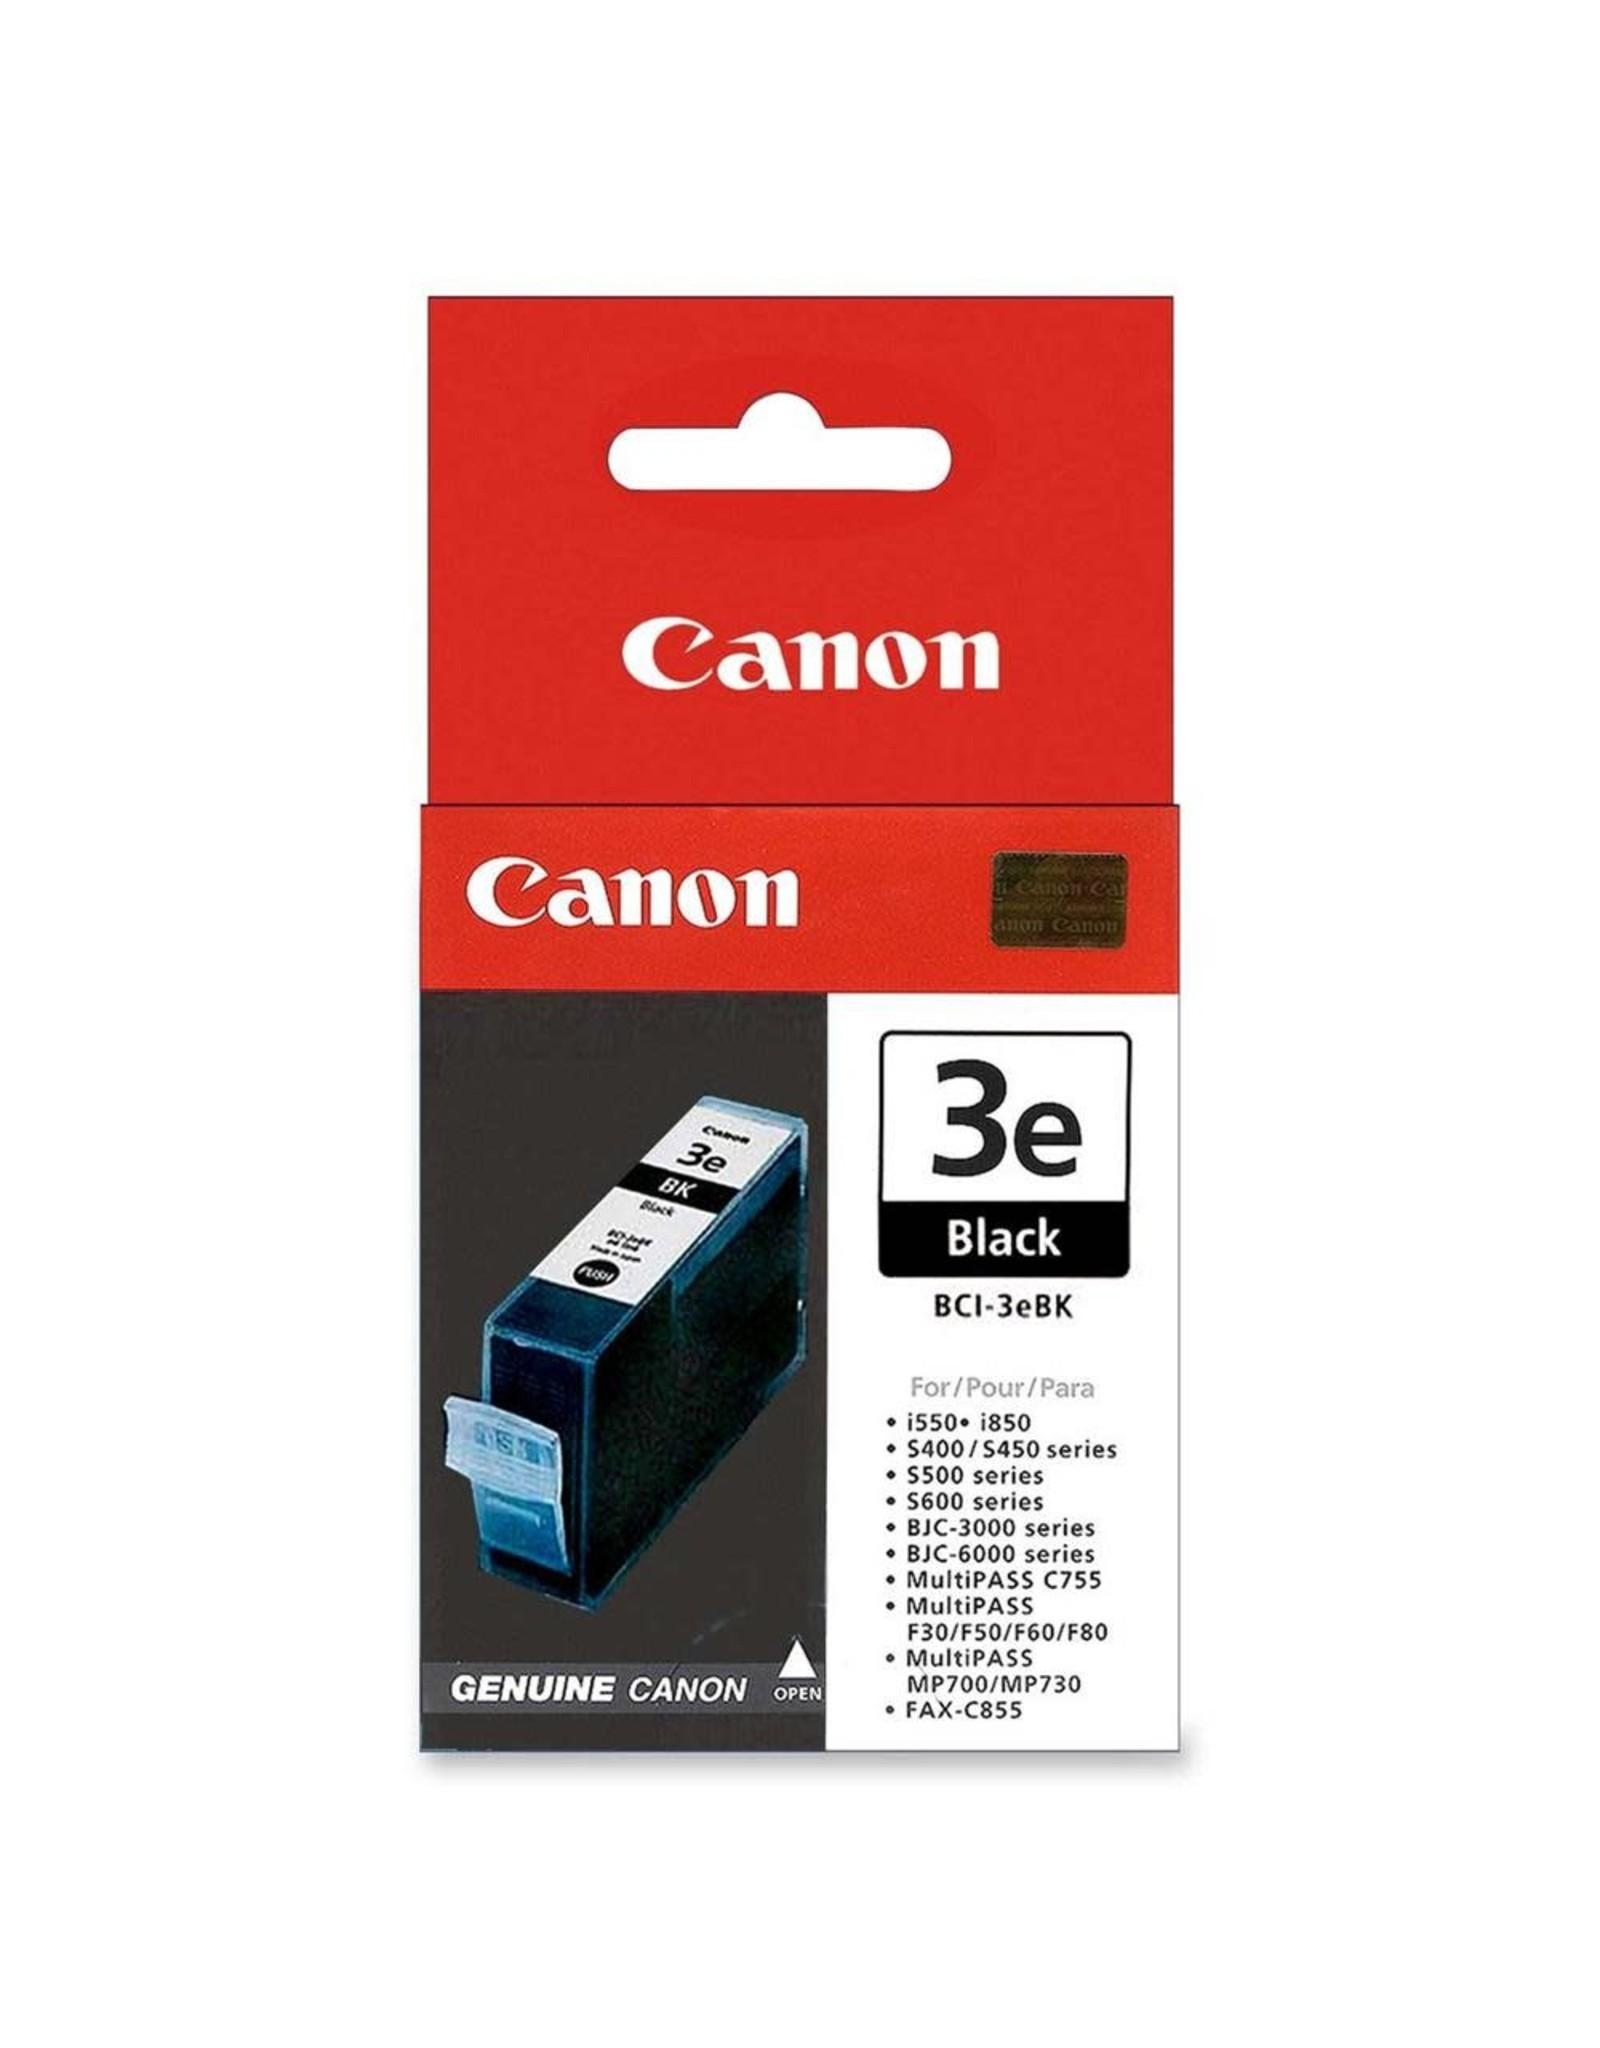 CANON CARTRIDGE 3E